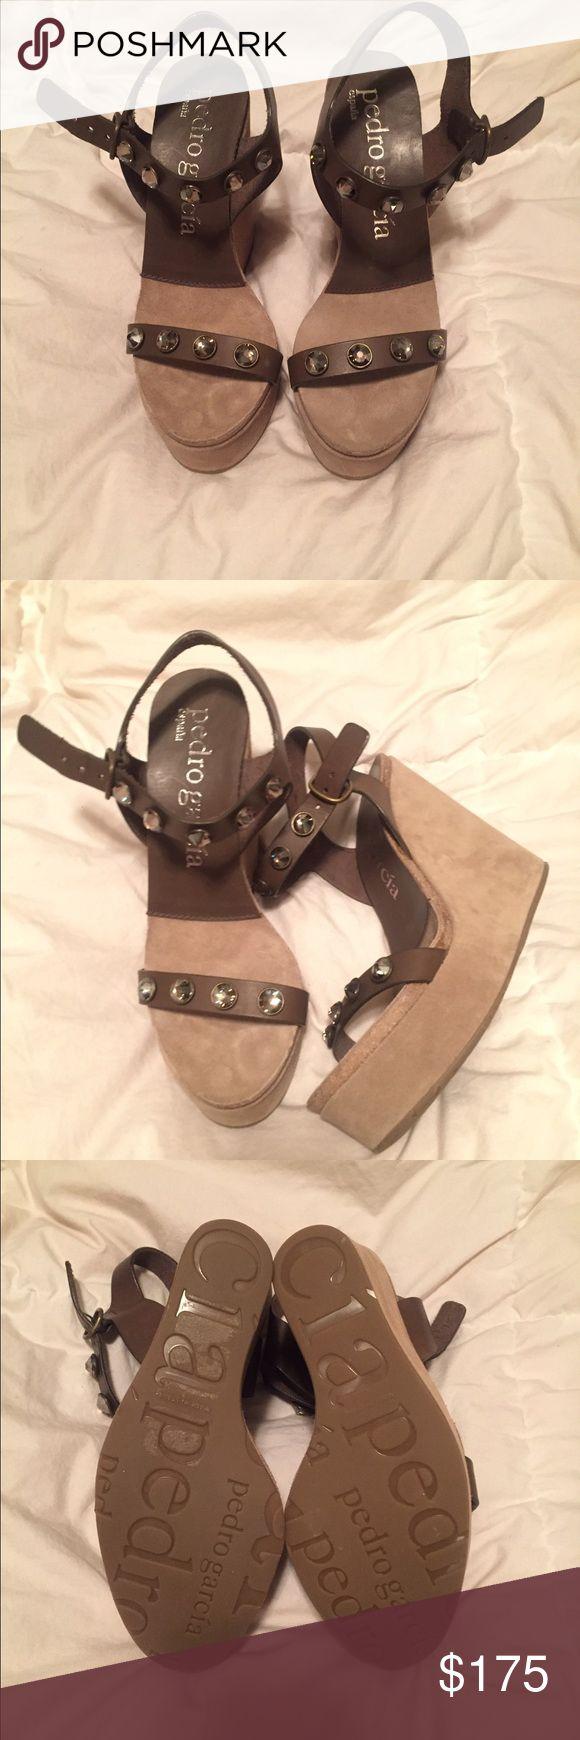 Wedge sandals Pedro Garcia suede wedge heels. Never worn! Pedro Garcia Shoes Sandals